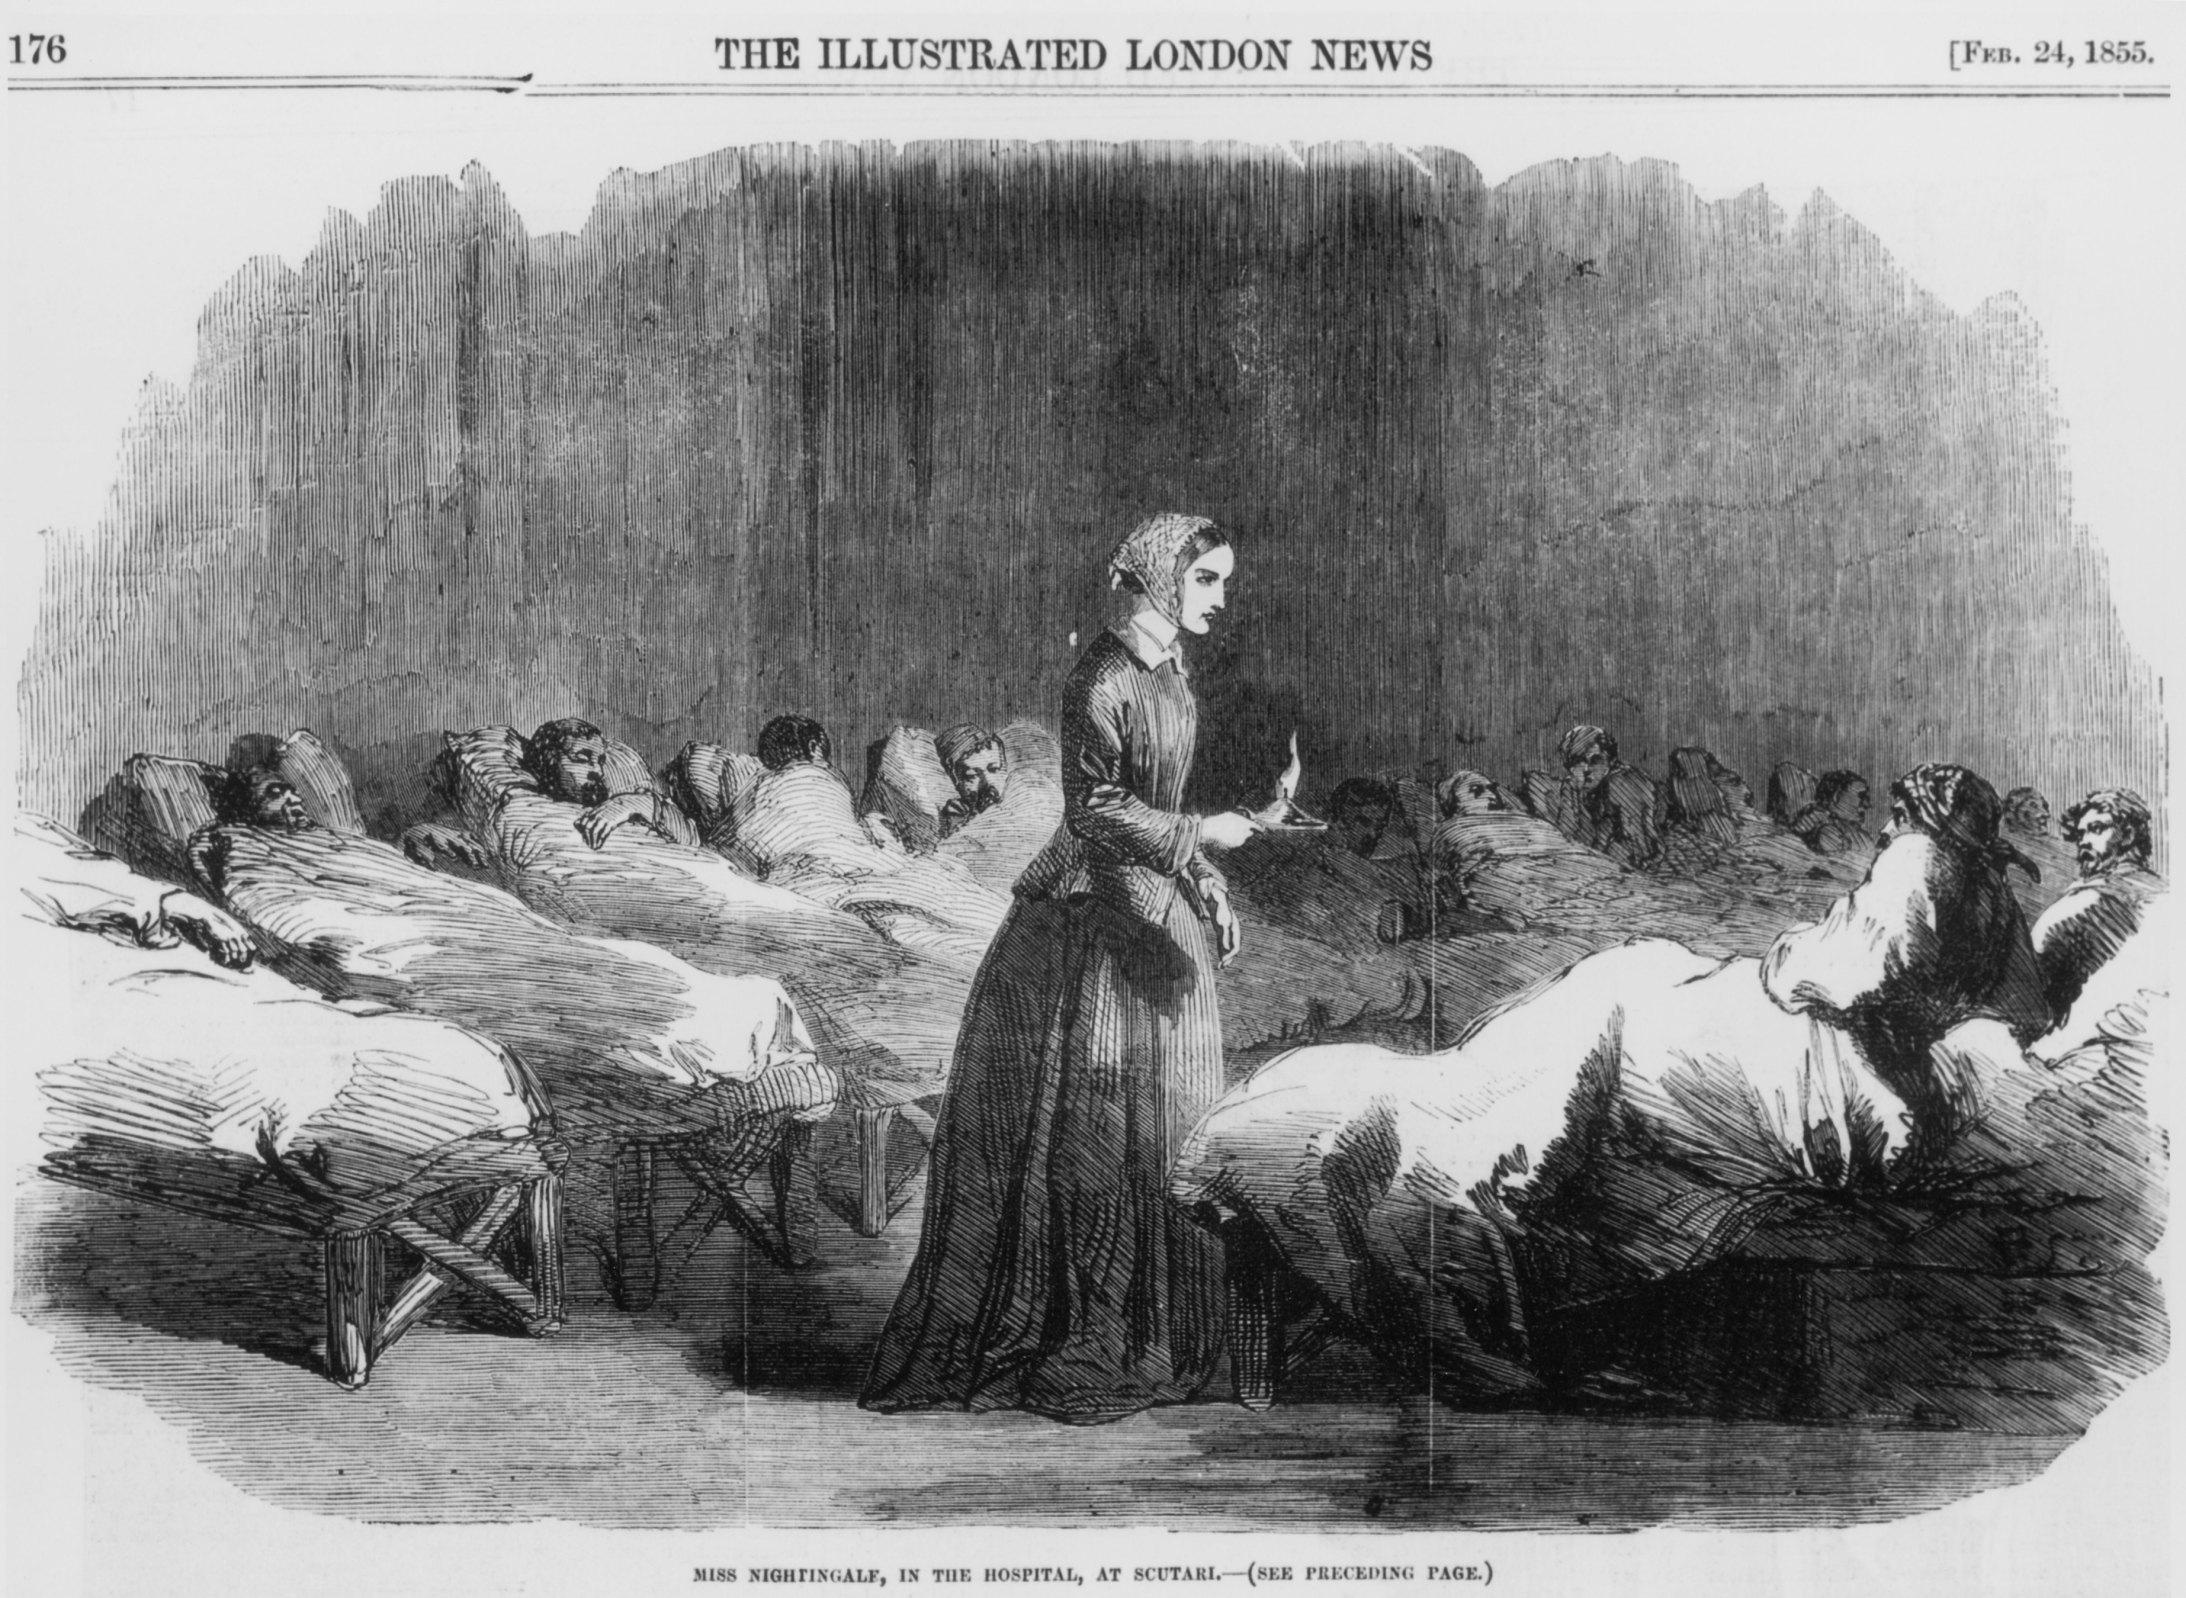 a biography and life work of florence nightingale an english social reformer Florence nightingale, om, rrc (/ˈflɒrəns ˈnaɪtɨŋɡeɪl/ 12 may 1820 – 13 august 1910) was a celebrated english social reformer and statistician, and the founder of modern nursing.